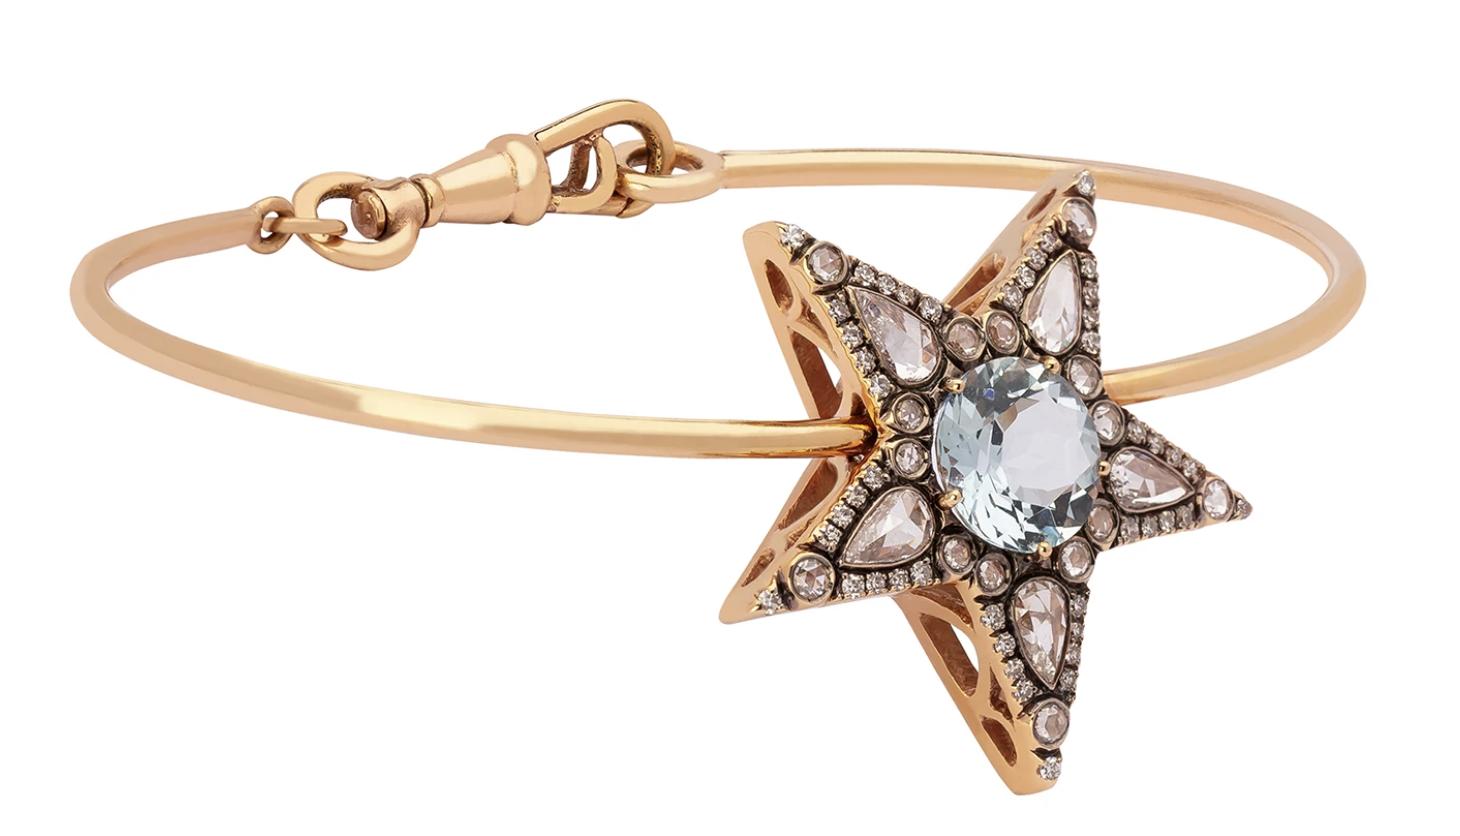 SELIM MOUZANNAR Istanbul Bracelet - Aquamarine, $6,480